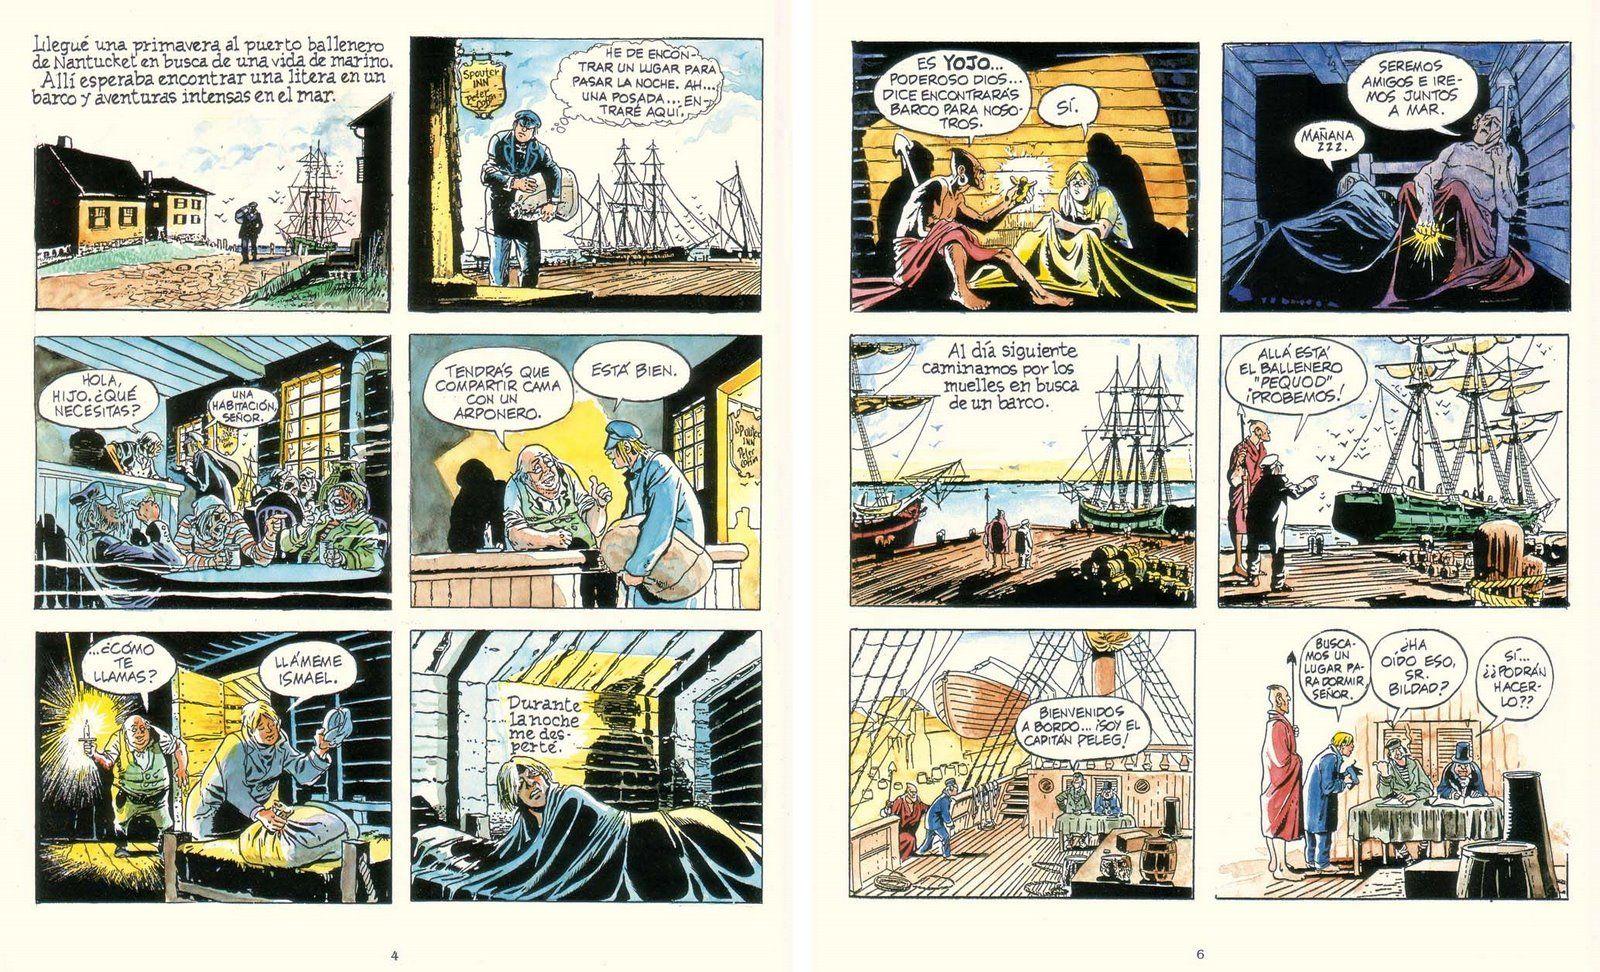 Texto de la biblioteca Moby Dick